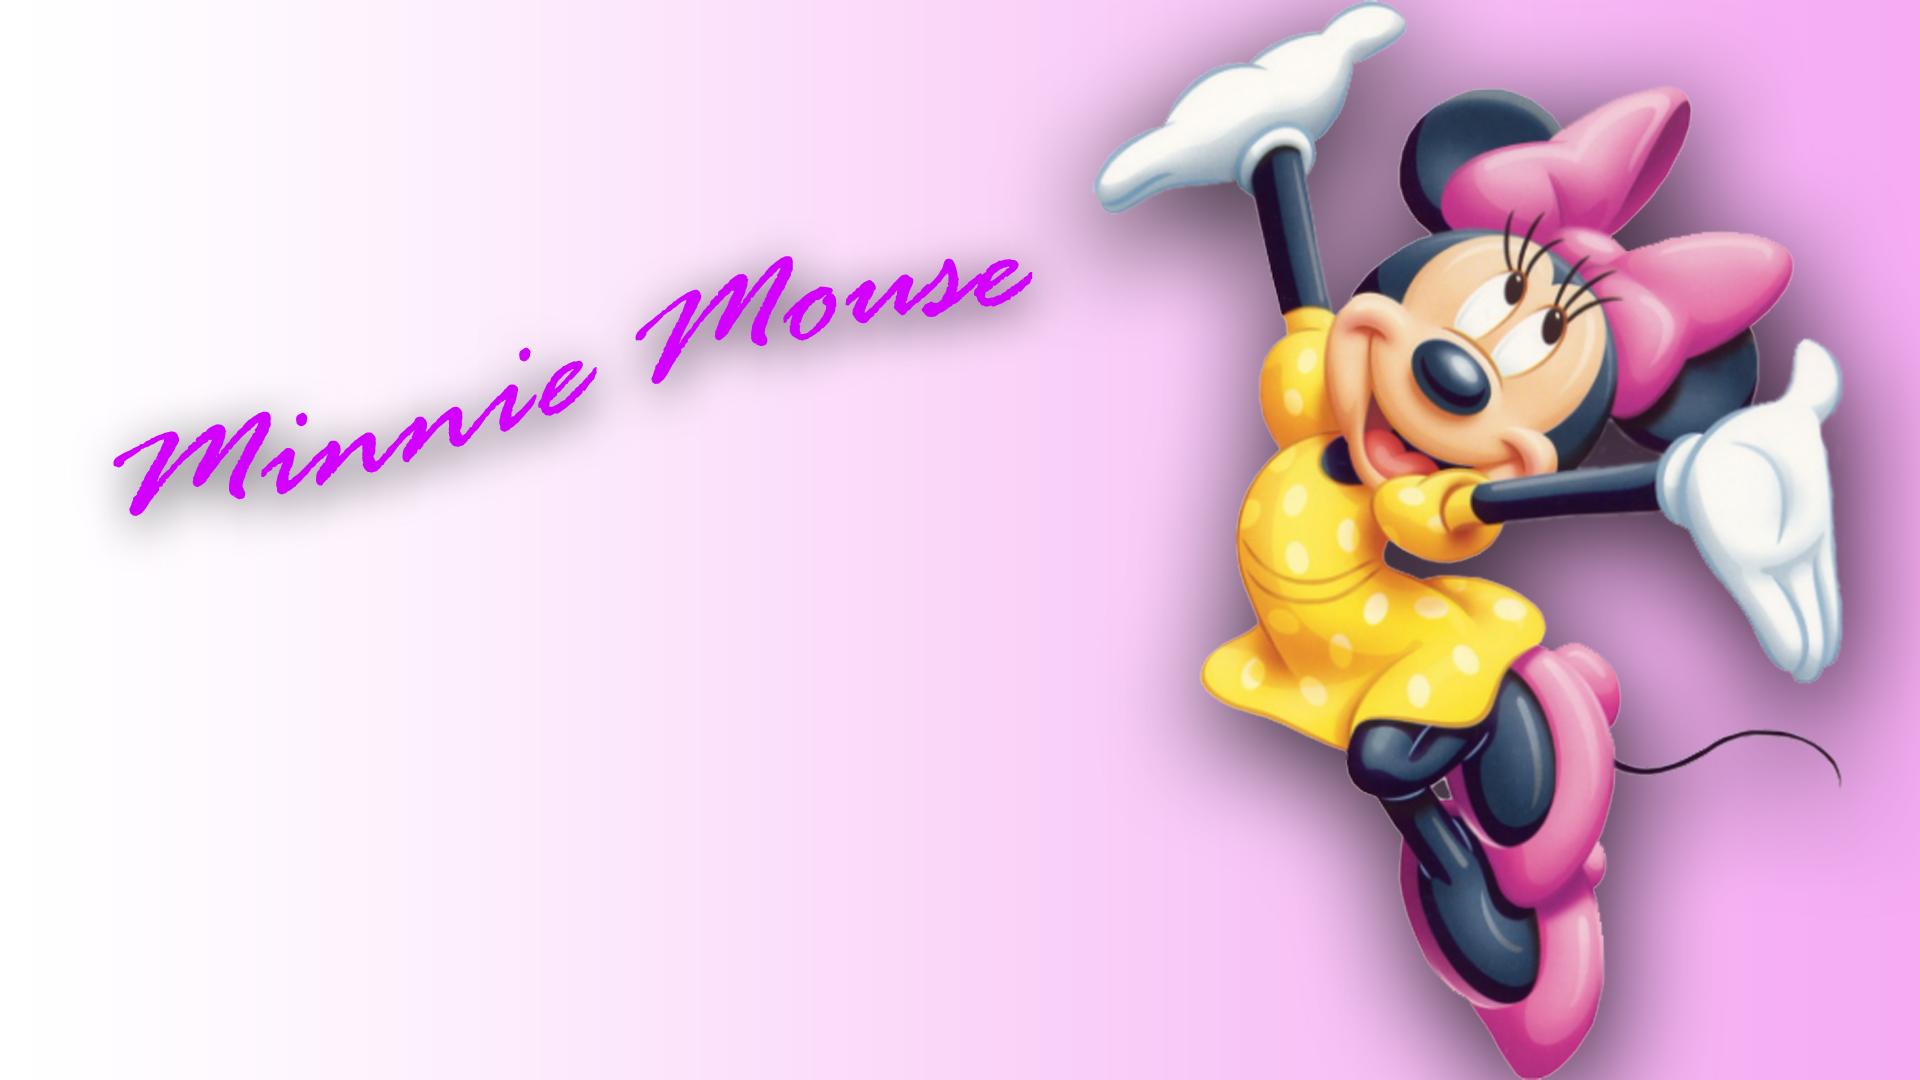 mickey and minnie desktop wallpaper wallpapersafari. Black Bedroom Furniture Sets. Home Design Ideas